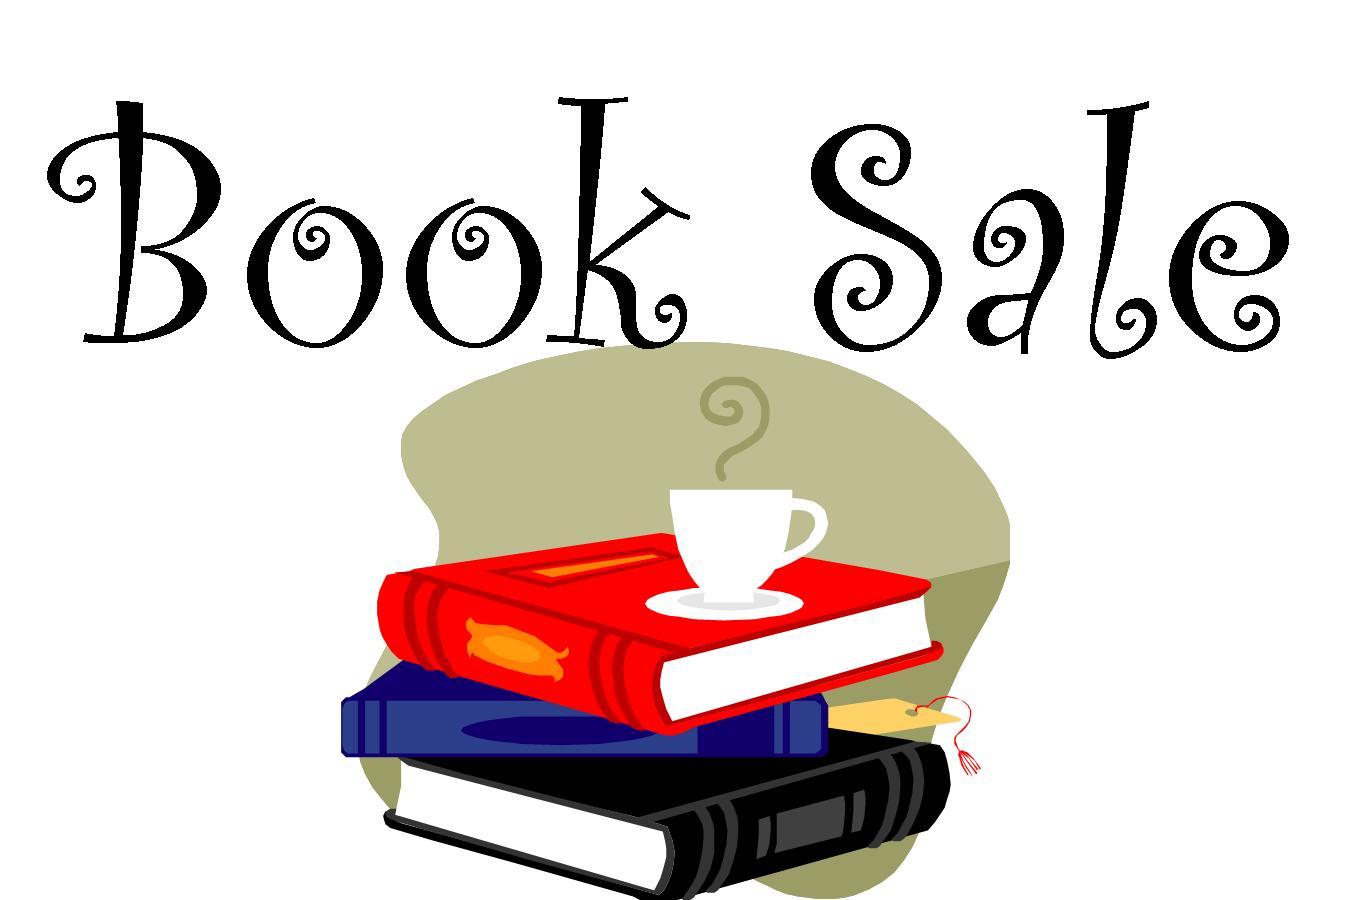 book fair clipart at getdrawings com free for personal use book rh getdrawings com book fair clipart scholastic book fair clipart 2017